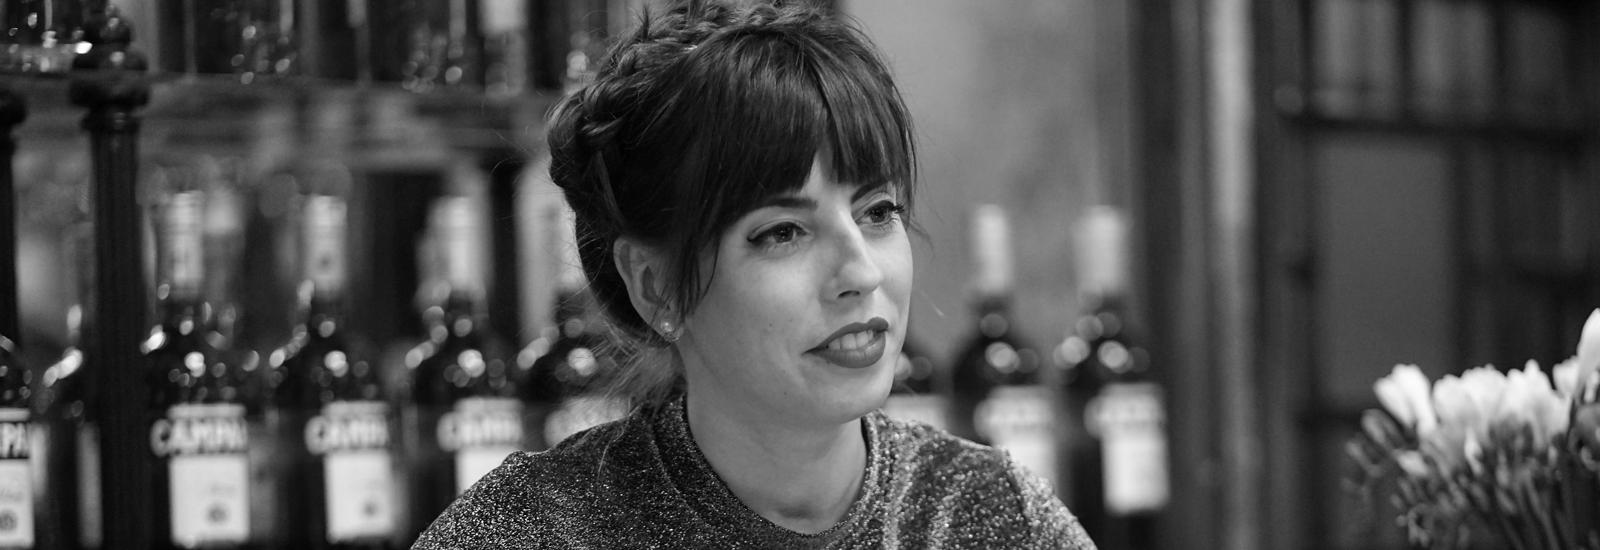 MARINA PIPI YALOUR, bartender, Campari